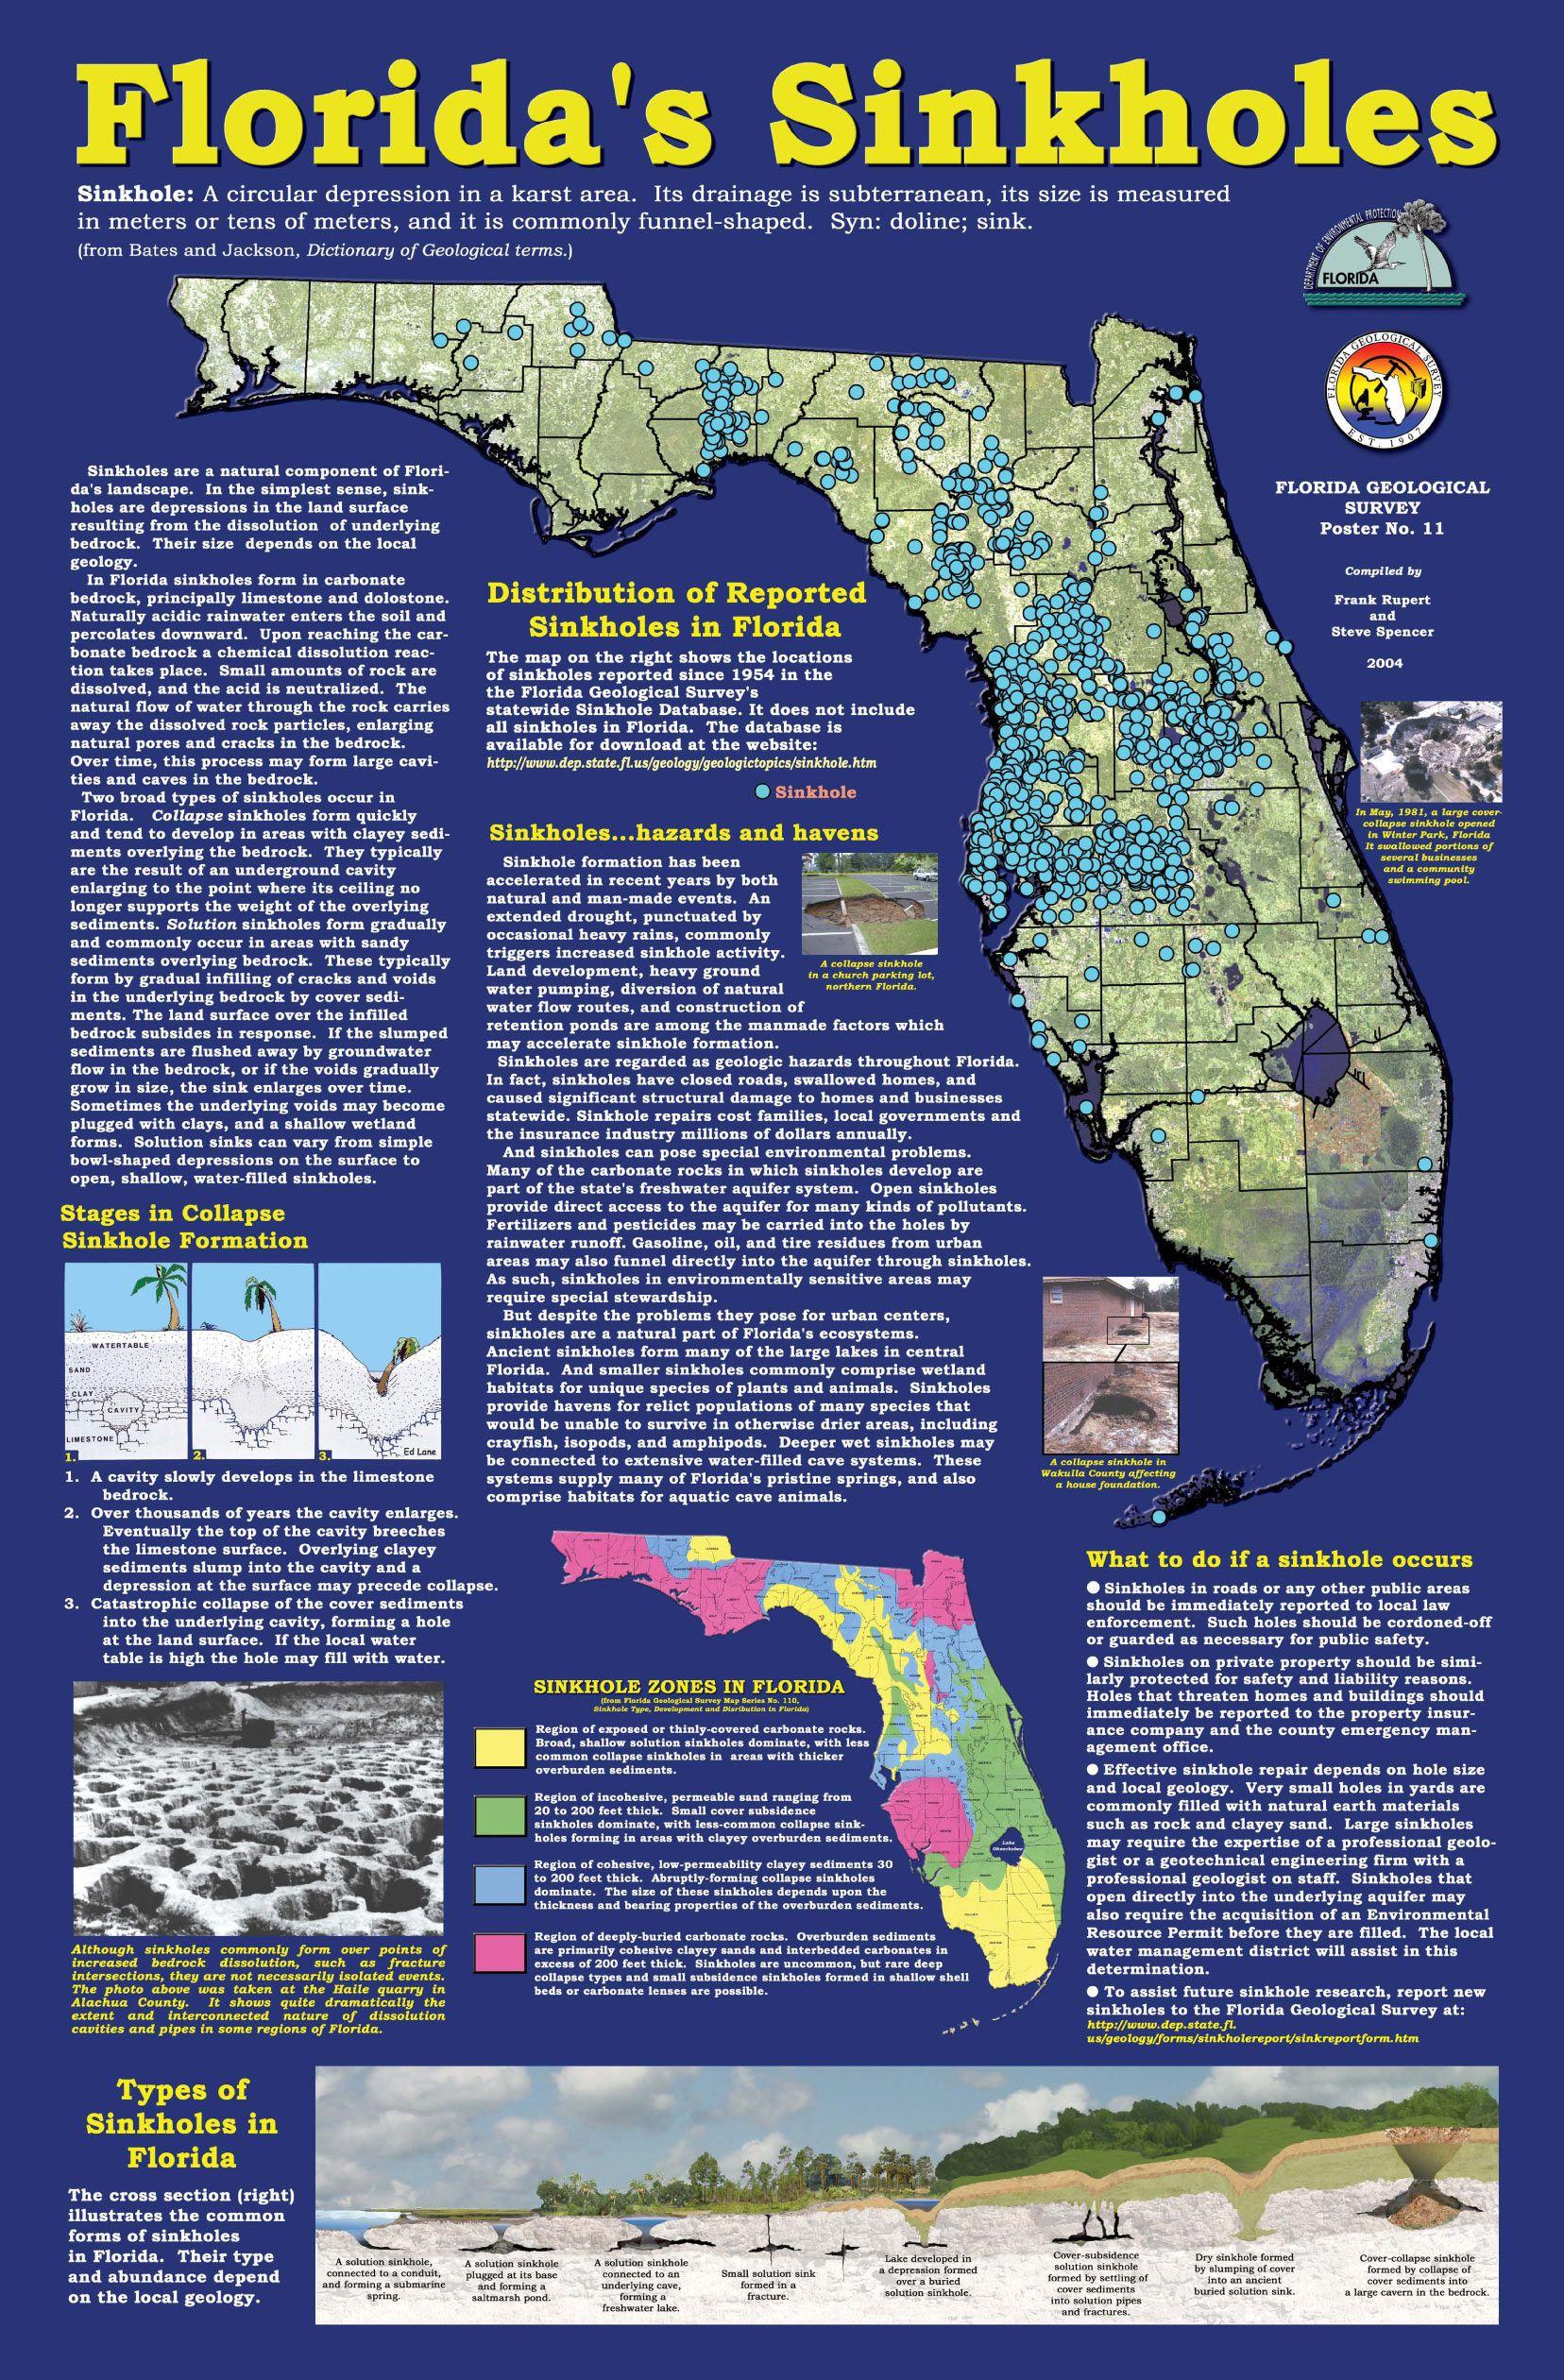 Florida Sinkhole Map | Mysterious Sinkholes | Pinterest - Florida Sinkhole Map 2018